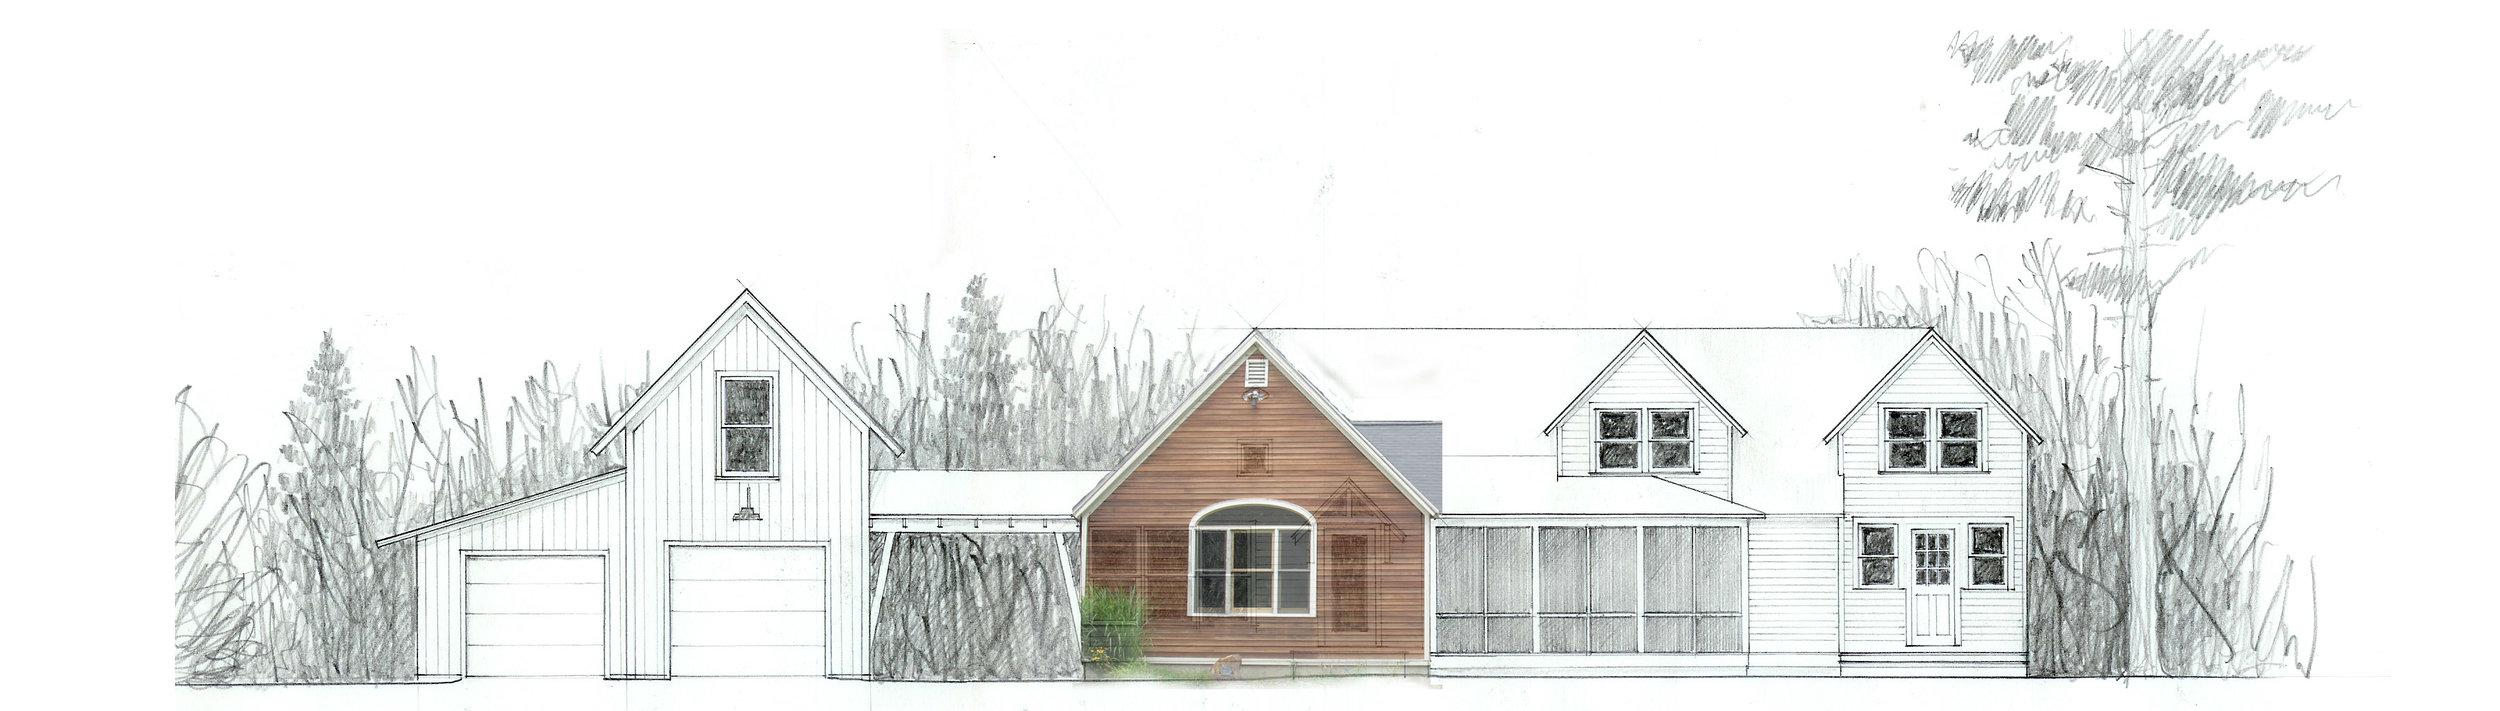 front elevation rendering copy.jpg